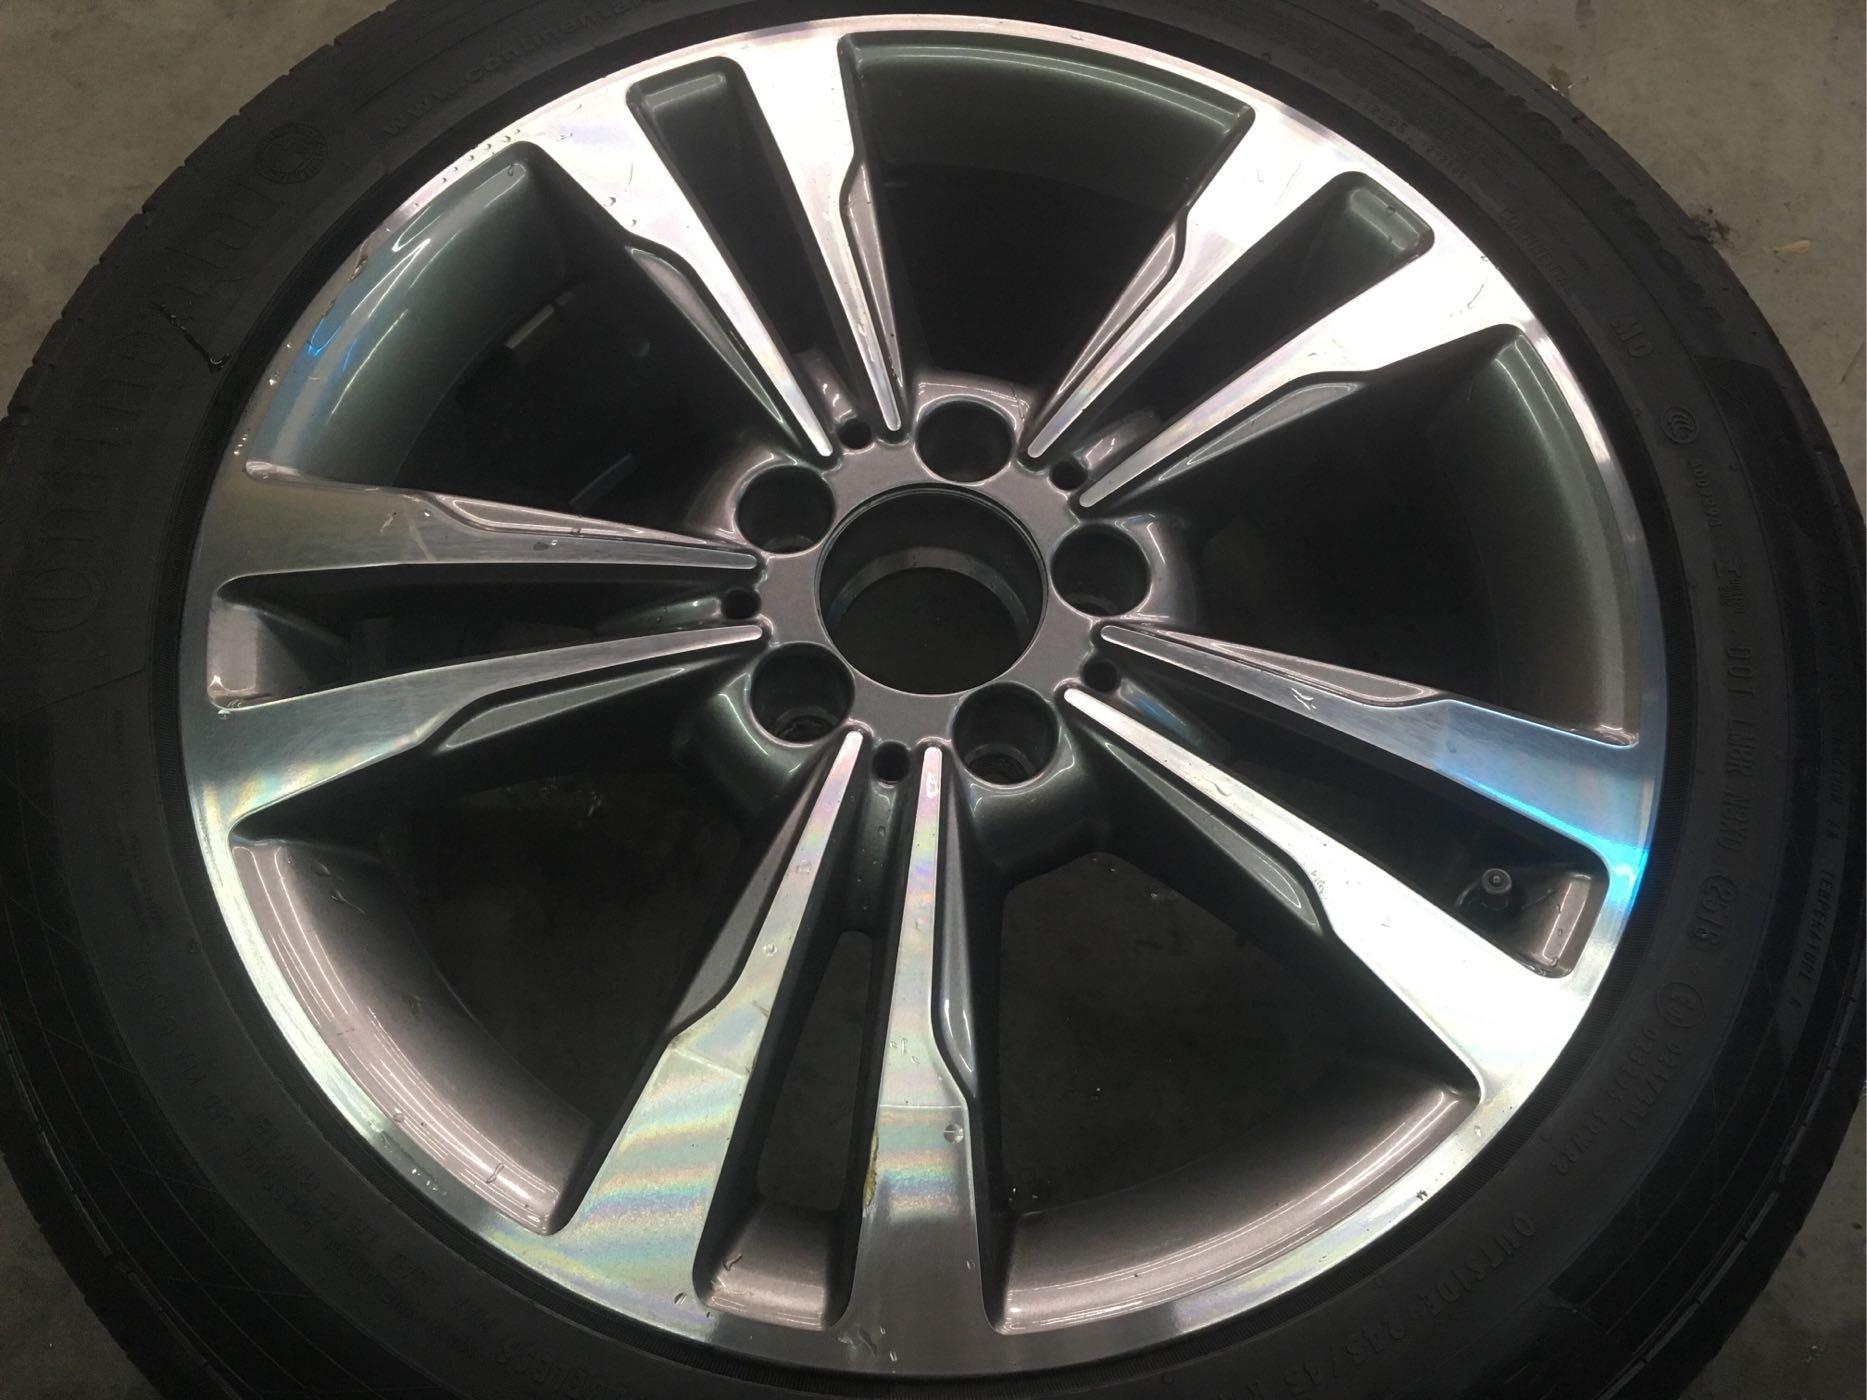 賓士 W212 E250 17吋 原廠雙色鋁圈 W204 W205 W176 C200 C250 A180 A200 僅剩一顆 無傷 狀態接近新品